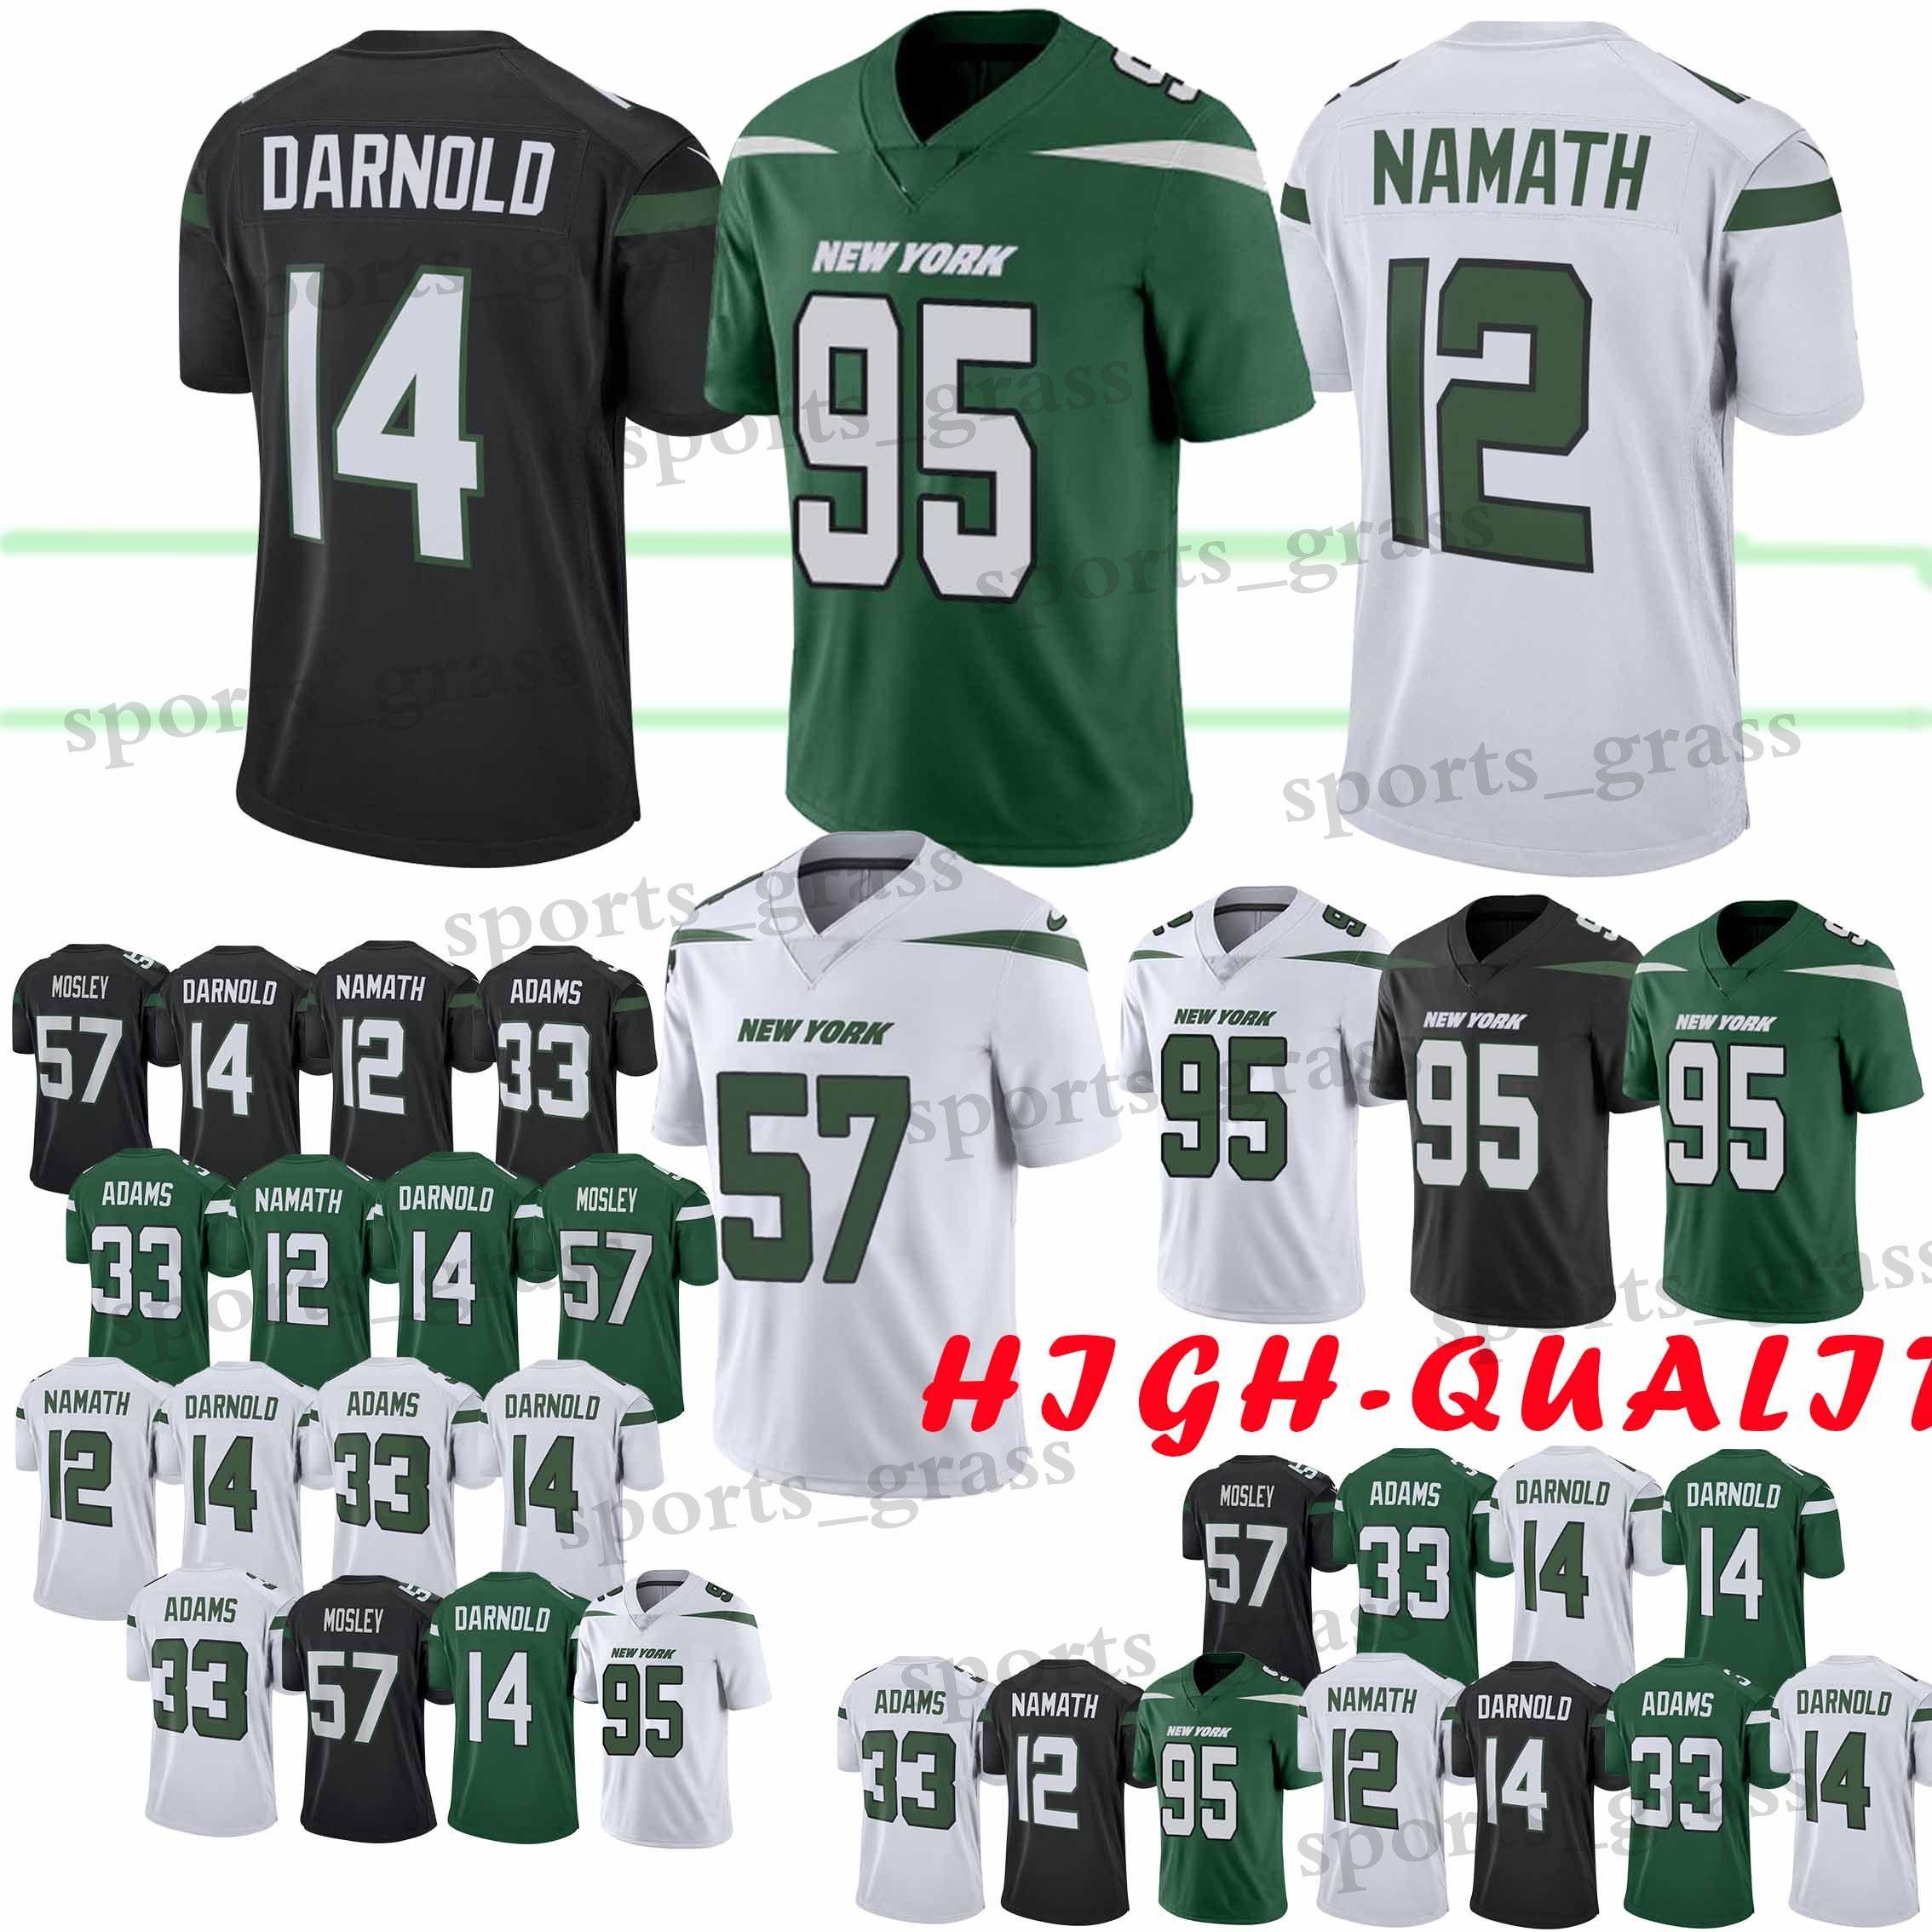 pretty nice 8ae43 240bf 33 Jamal Adams 95 Quinnen Williams York Jets jersey 26 Le'Veon Bell 14 Sam  Darnold 12 Joe Namath Football Jerseys